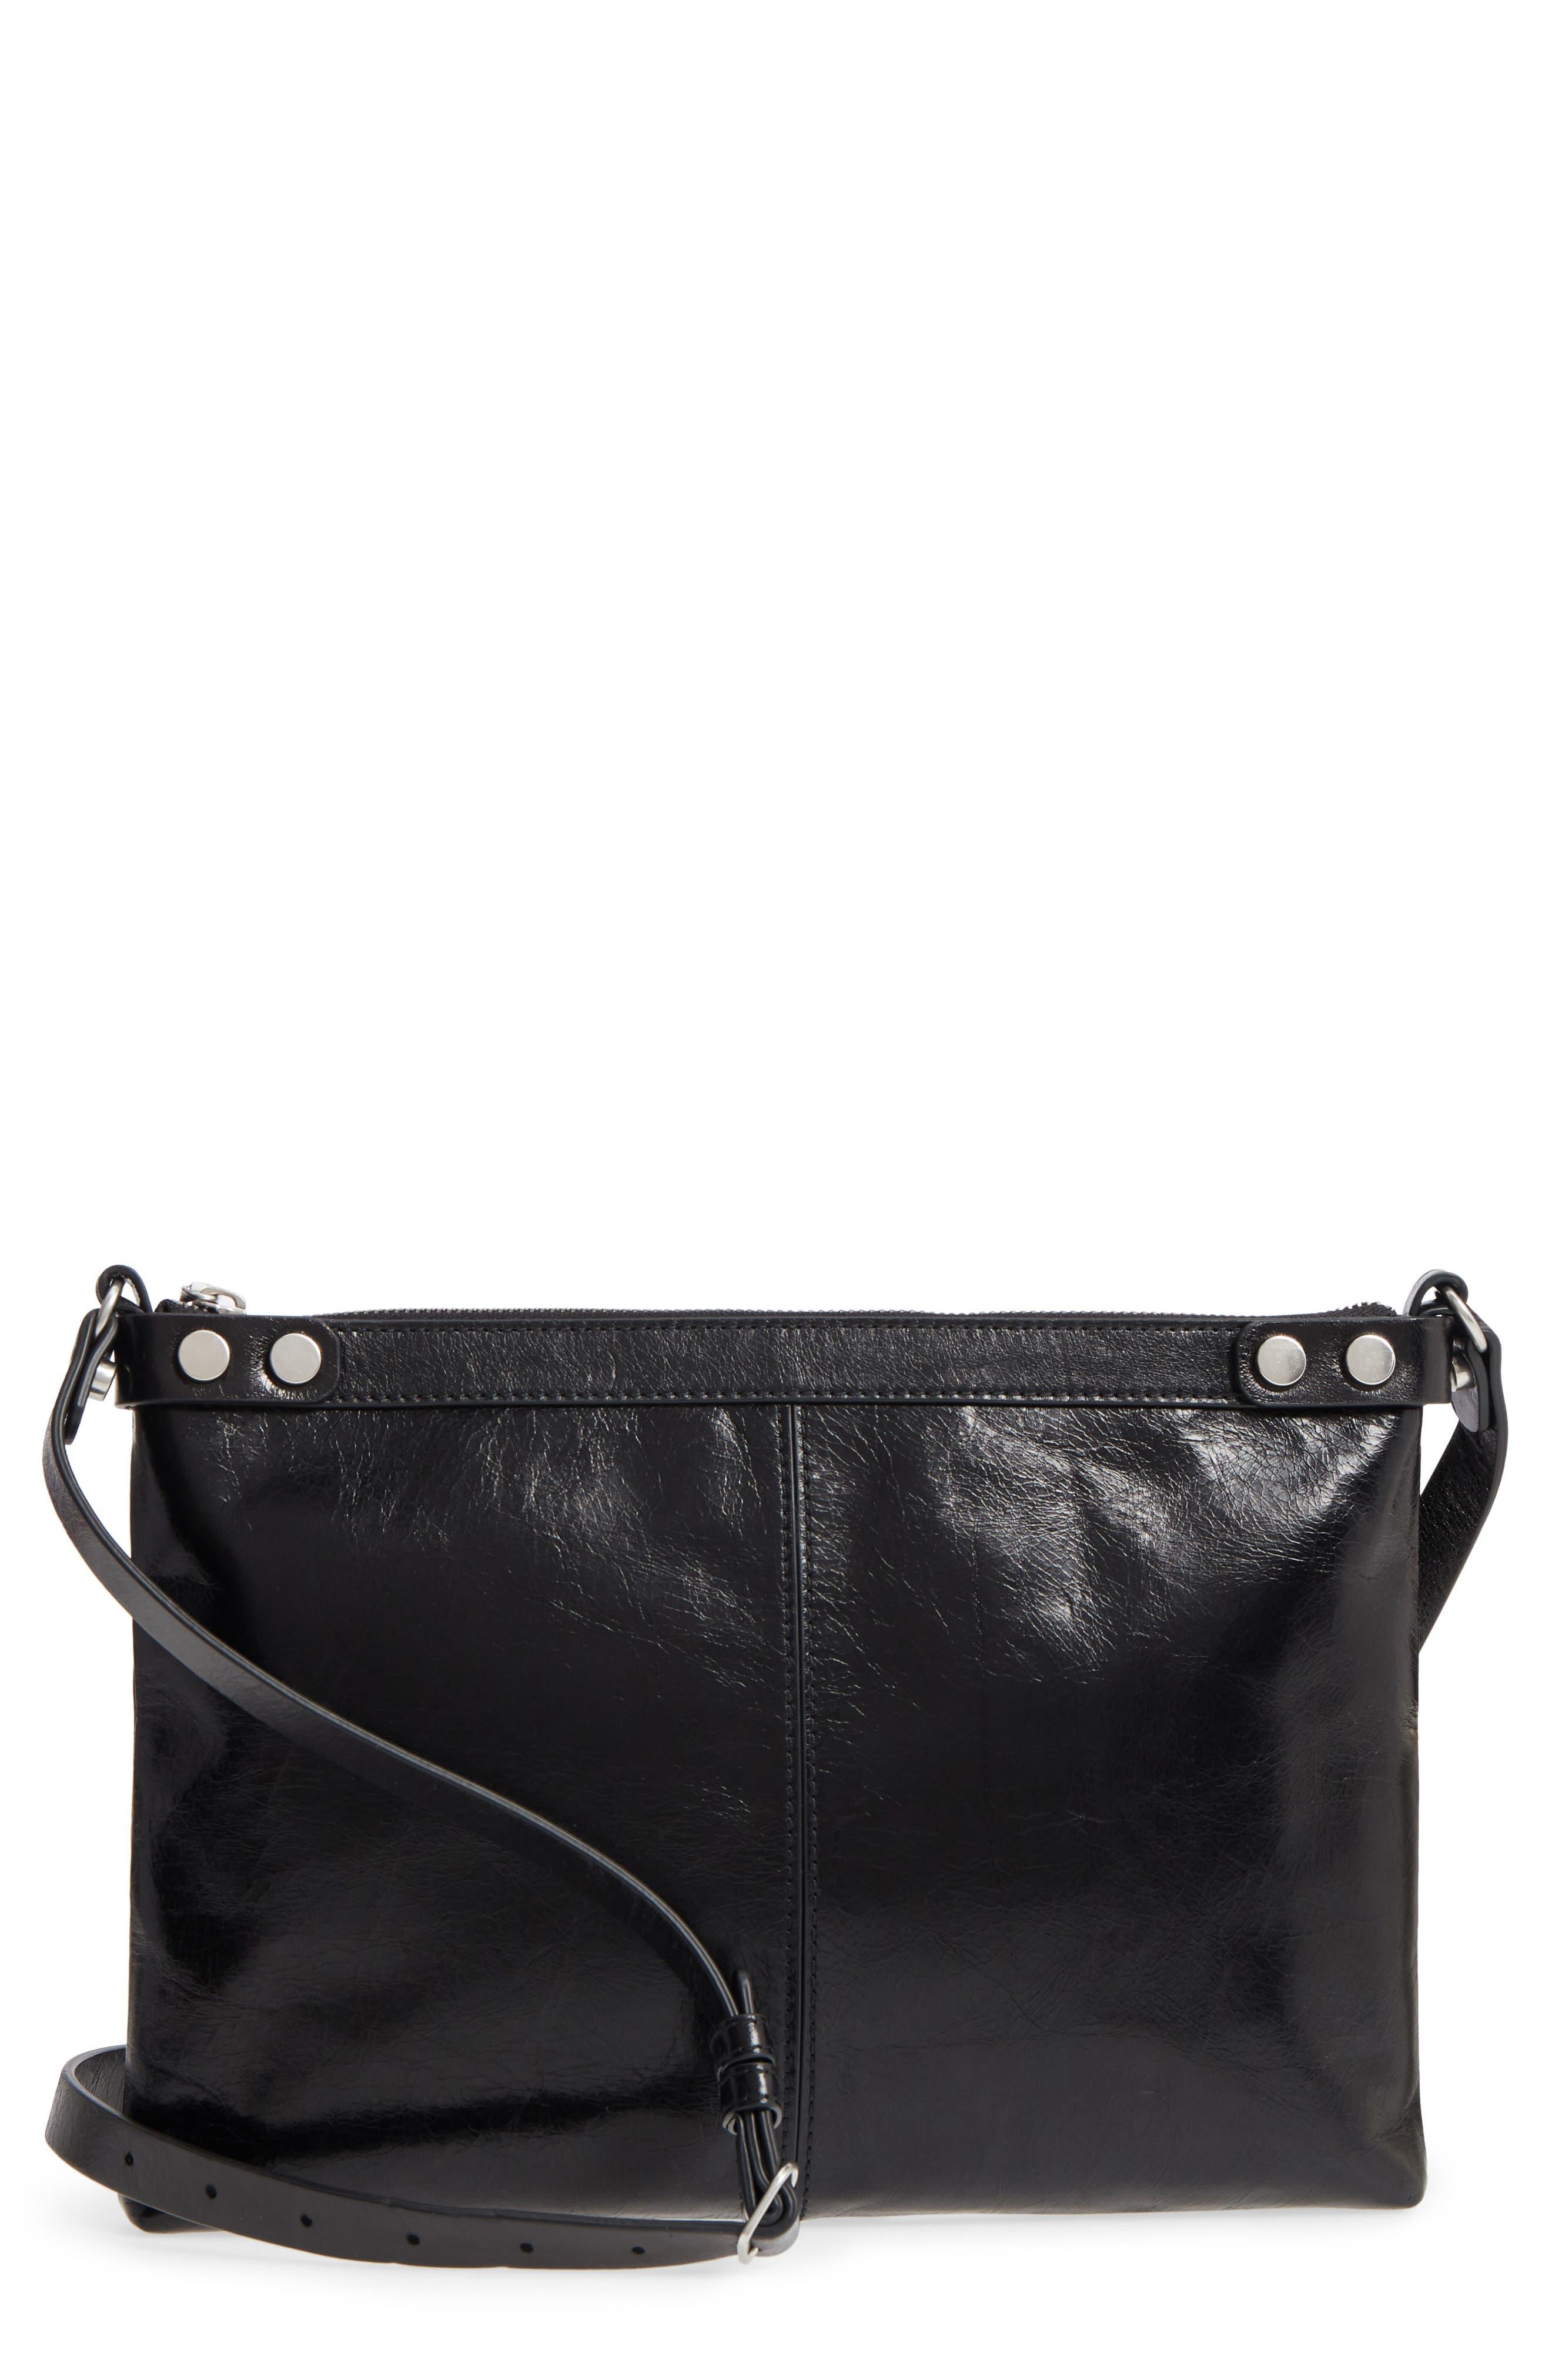 Marlow Glazed Leather Crossbody Bag,                             Main thumbnail 1, color,                             BLACK